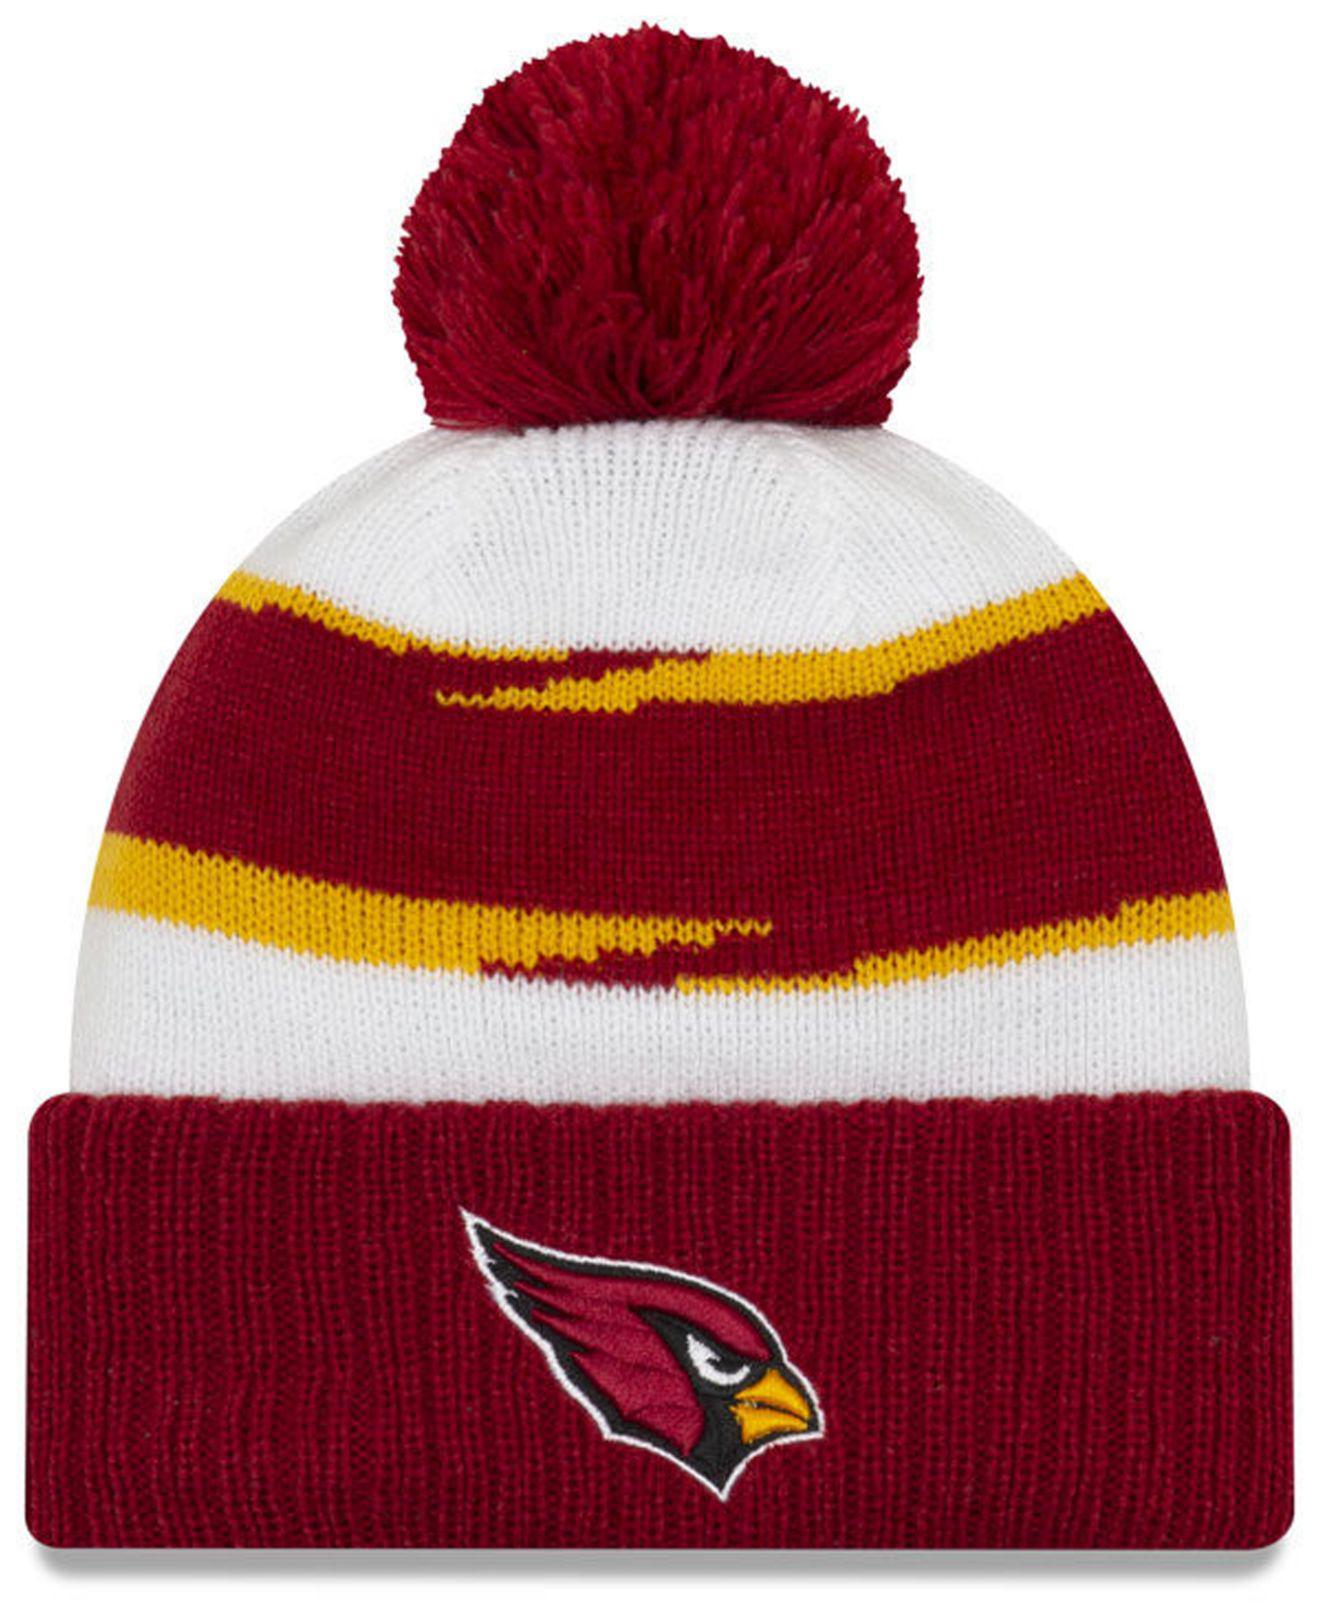 67f87e5b3c9 Lyst - Ktz Arizona Cardinals Thanksgiving Pom Knit Hat in Red for Men